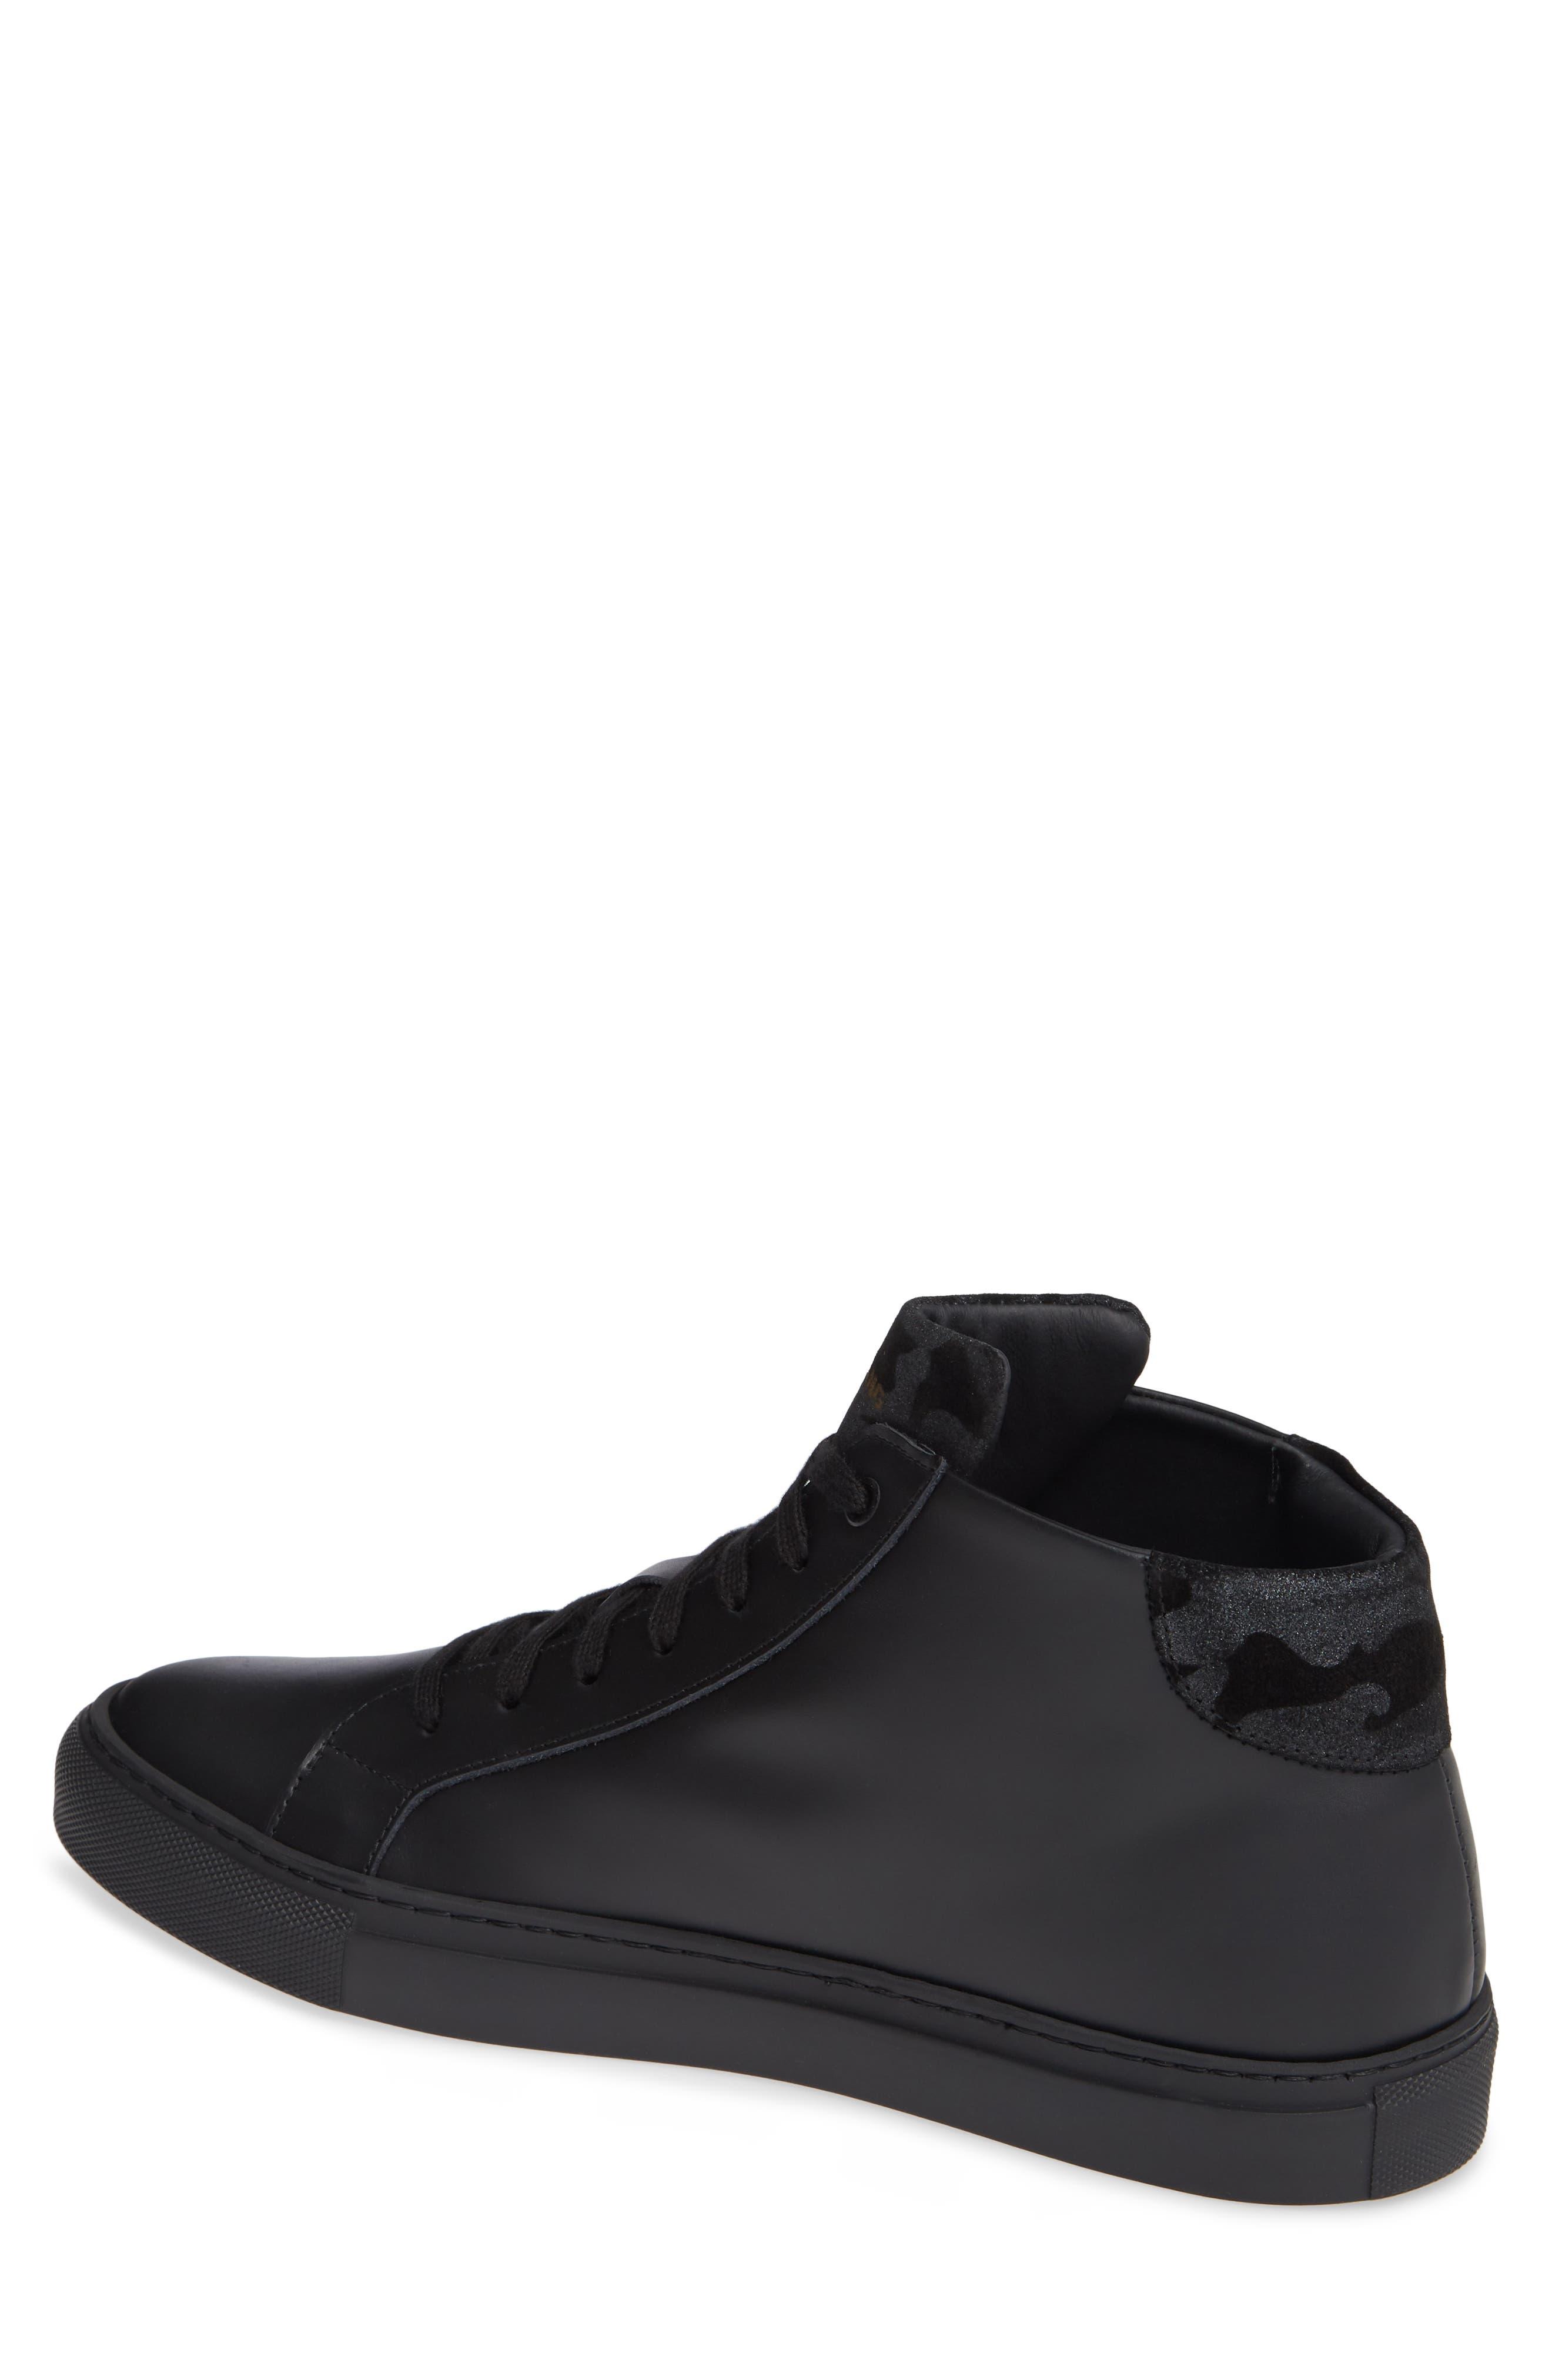 Rome High Top Sneaker,                             Alternate thumbnail 2, color,                             BLACK